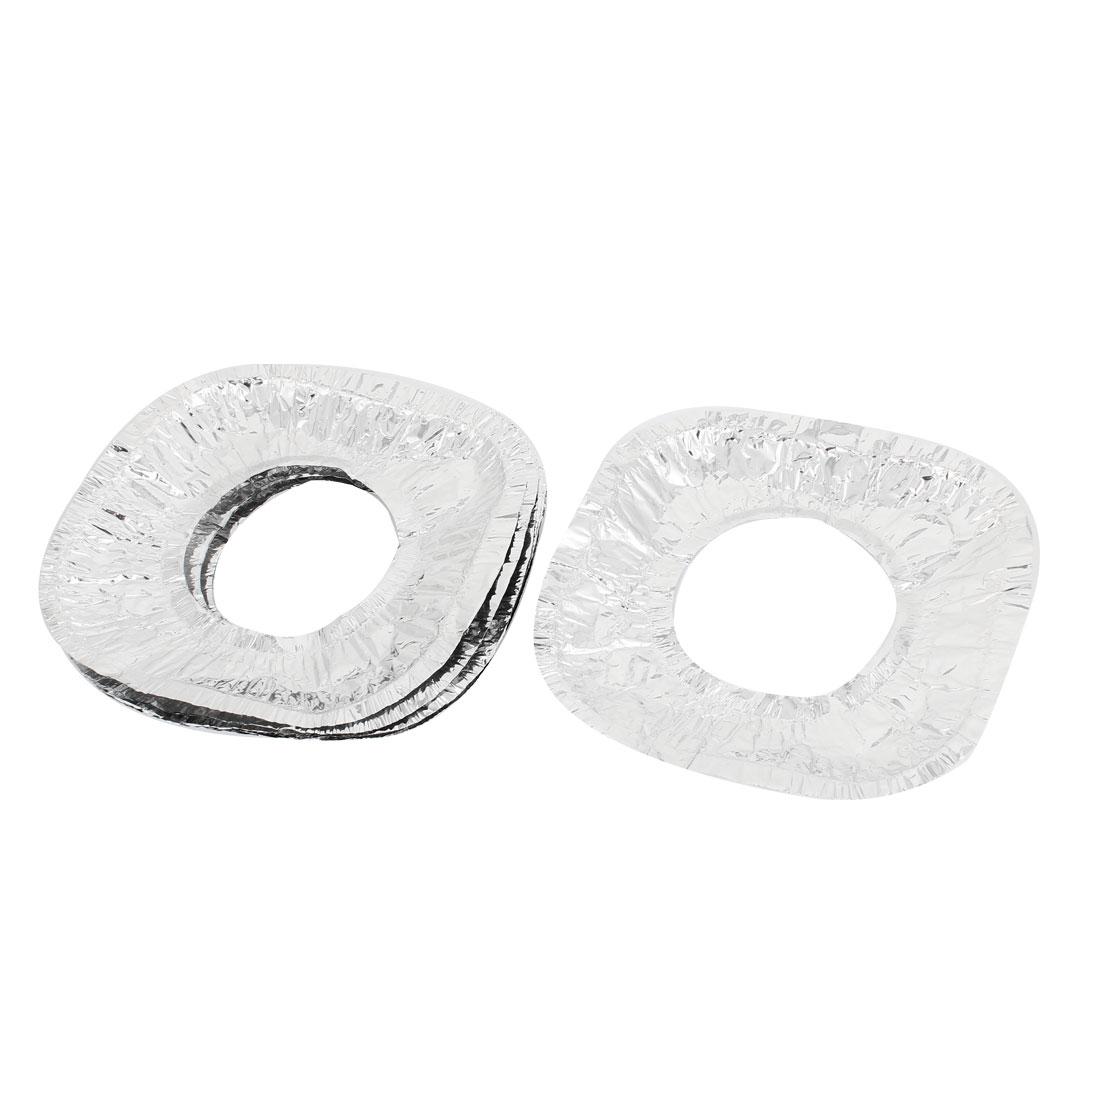 Kitchen Disposable Aluminum Foil Square Gas Burner Bib Liner